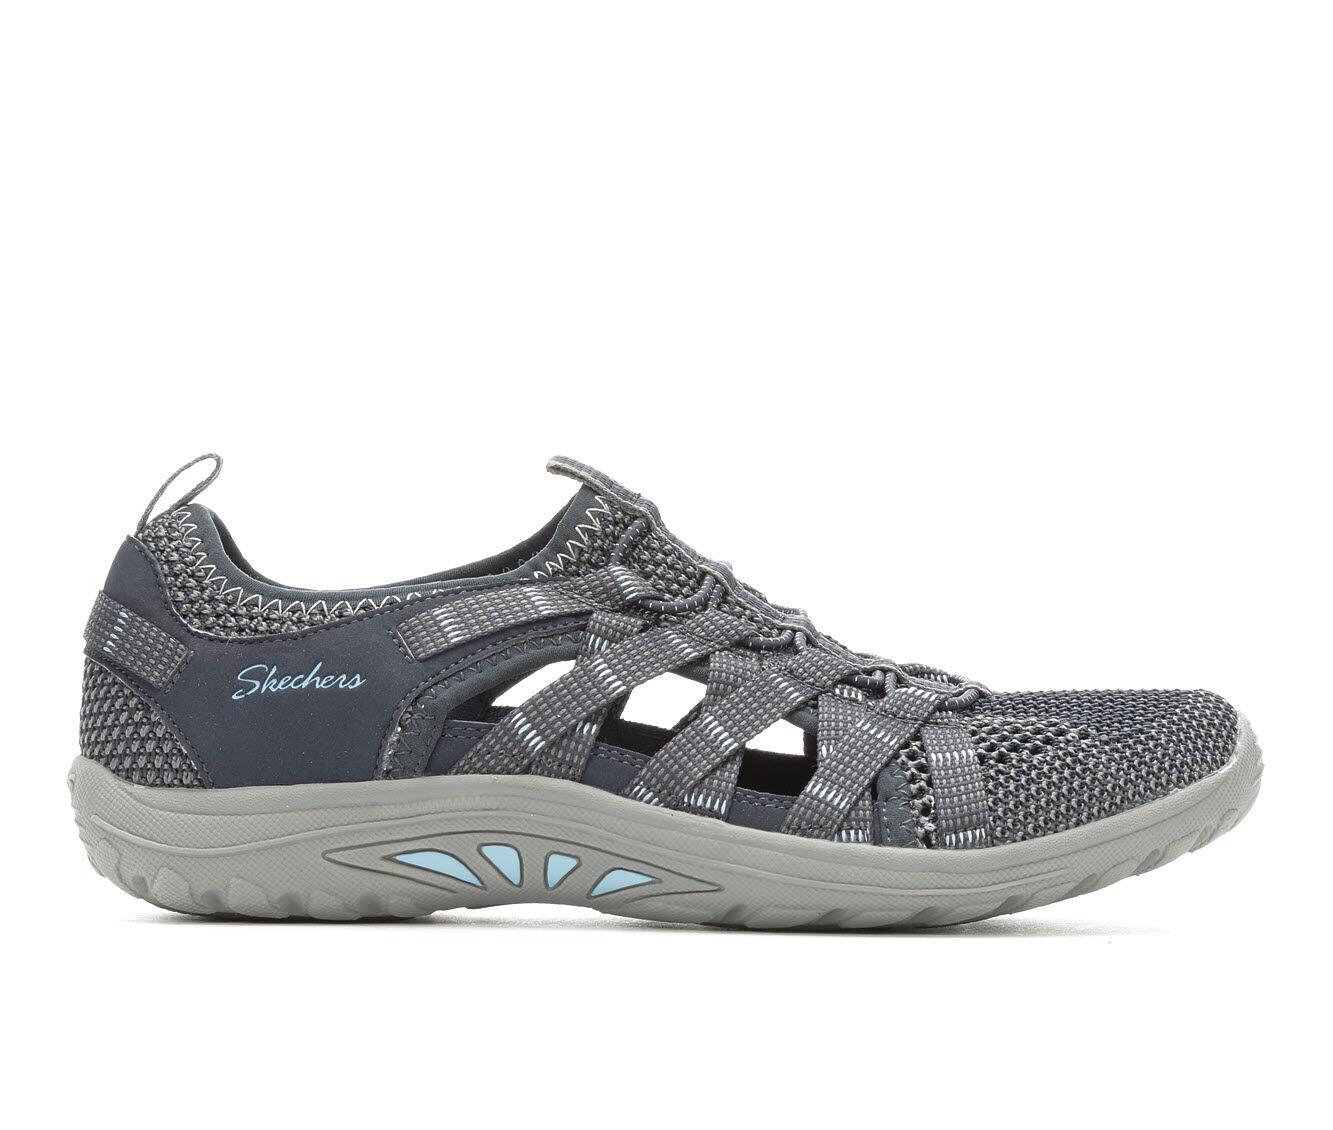 Women's Skechers Neap 49589 Slip-On Shoes Navy